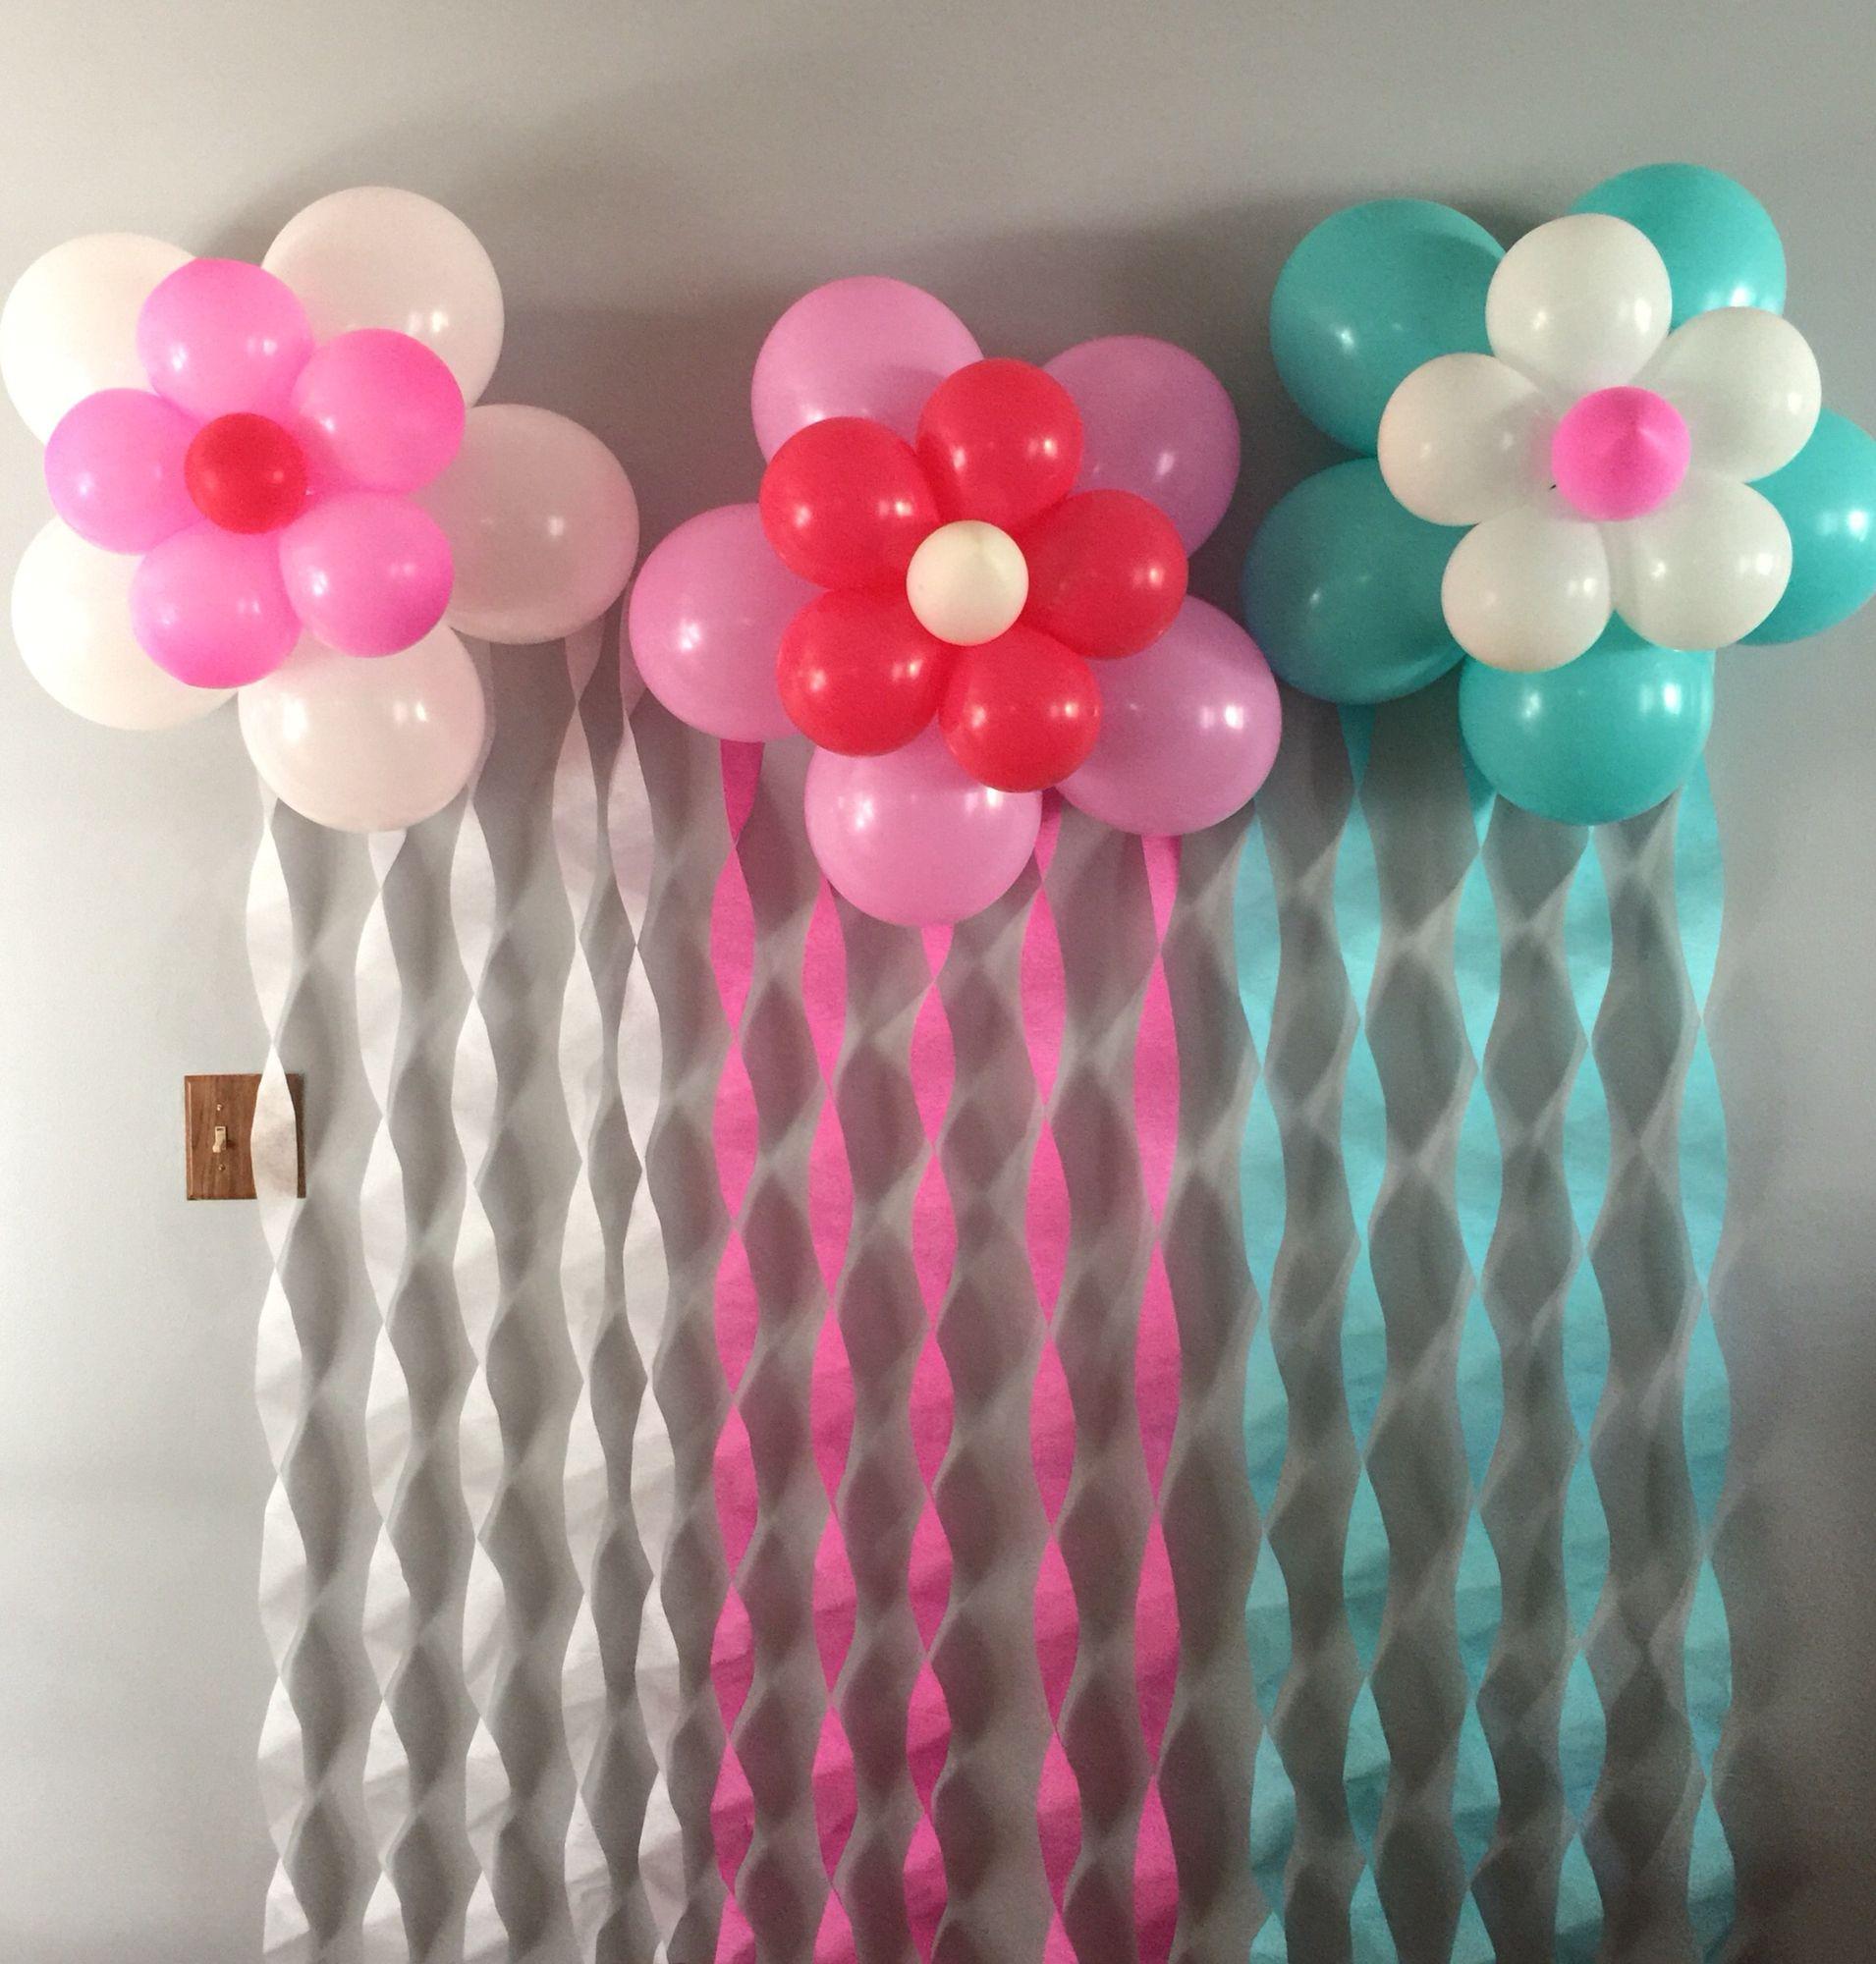 Balloon Decorations, Balloons, Bridal Showers, Cata, Tortilla, Fiesta Party, Globes,